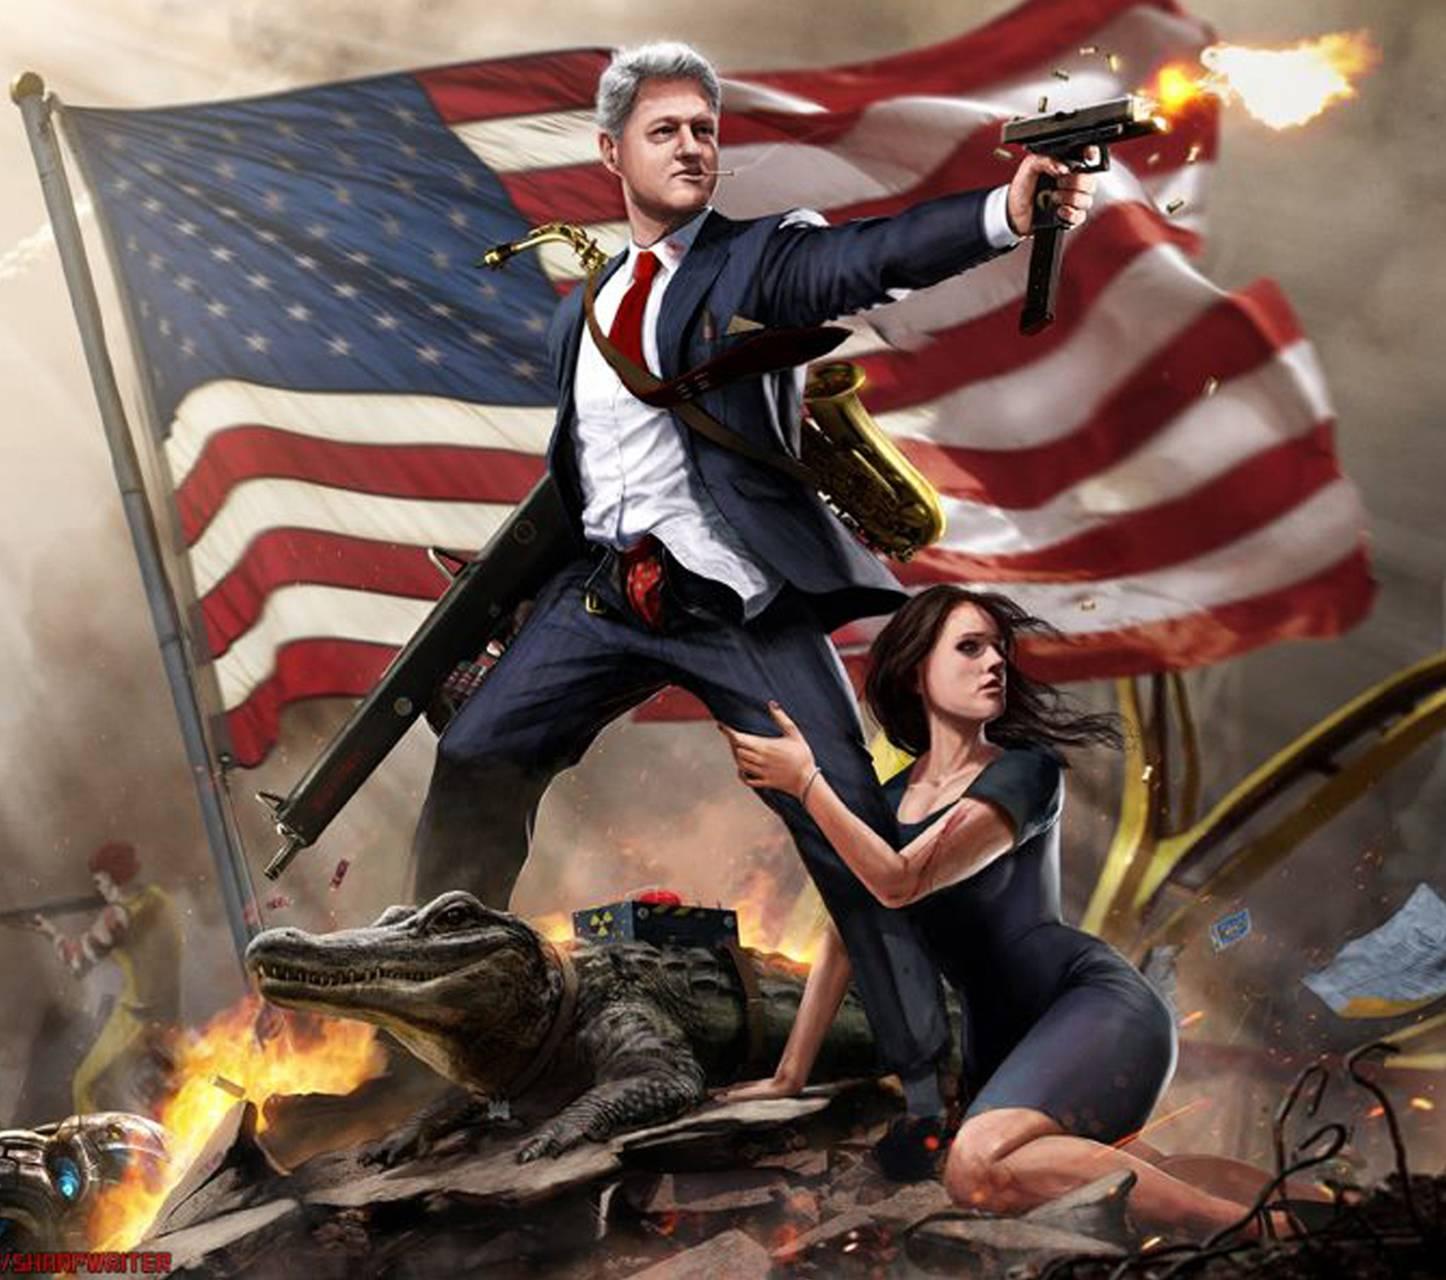 Bill Clinton Wallpaper by ZeusImages - d3